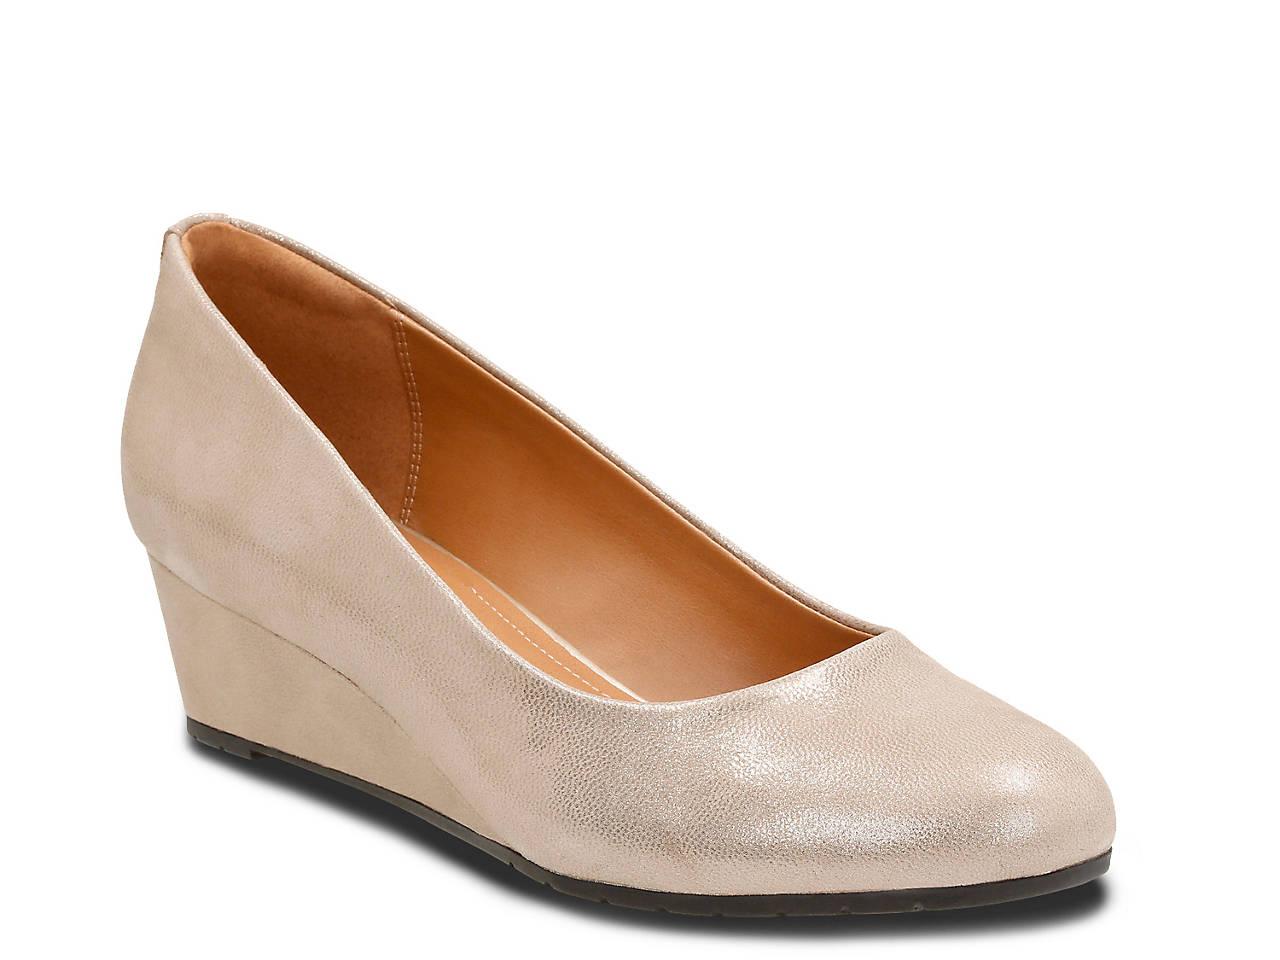 0bbf7a98eb7 Clarks Vendra Bloom Wedge Pump Women s Shoes